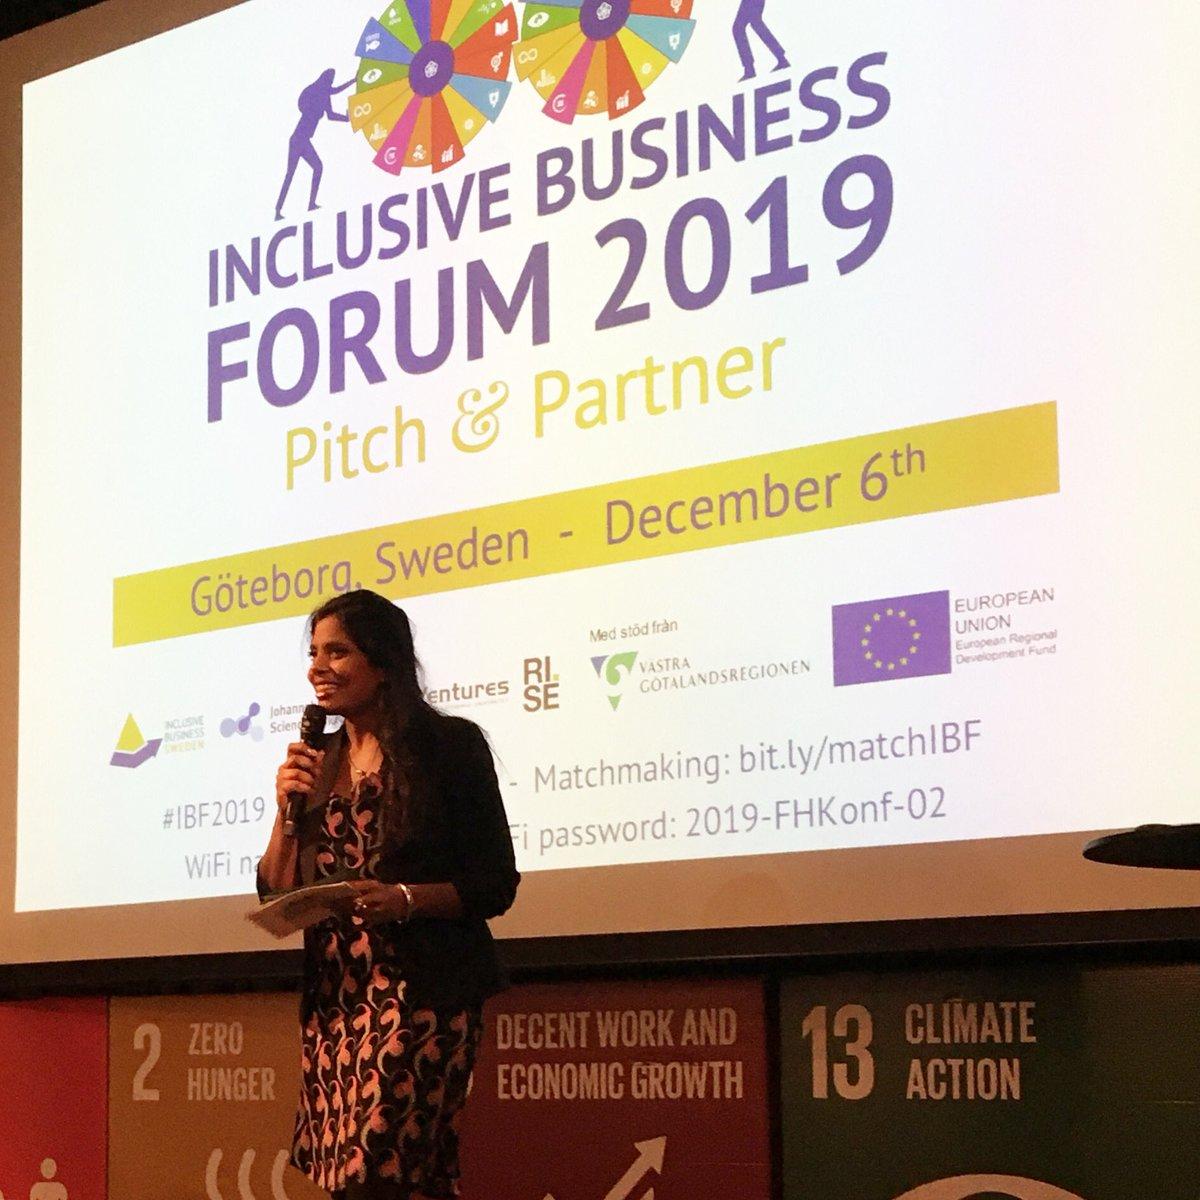 Inclusive Business Forum 2019 kicking off in Göteborg #ibf2019  #socentpic.twitter.com/CUCMdO8nbc